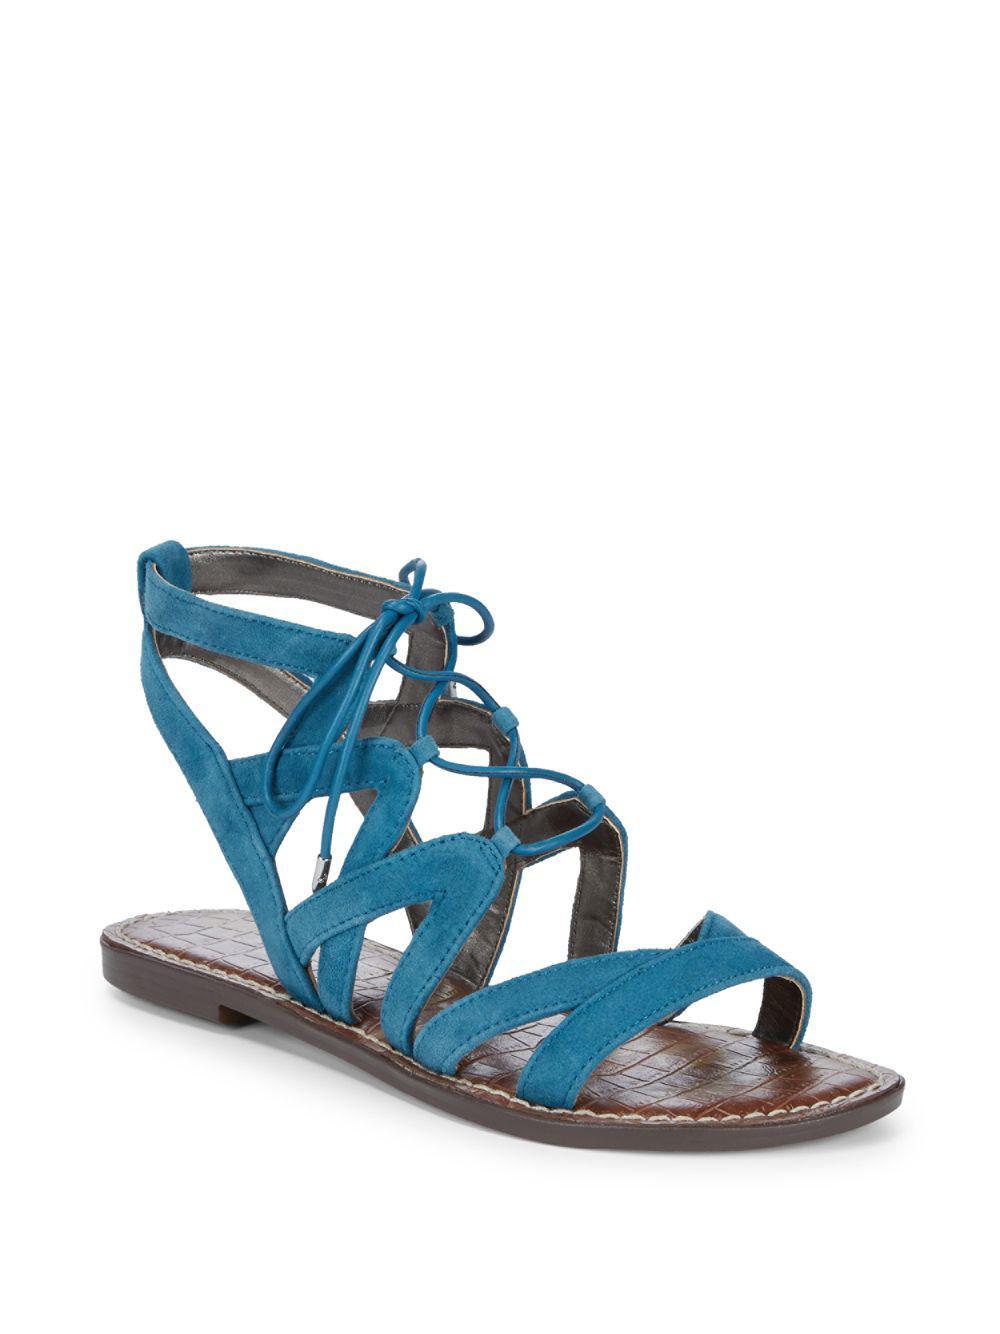 e29f179ec33 Lyst - Sam Edelman Gemma Lace-up Leather Sandals in Blue